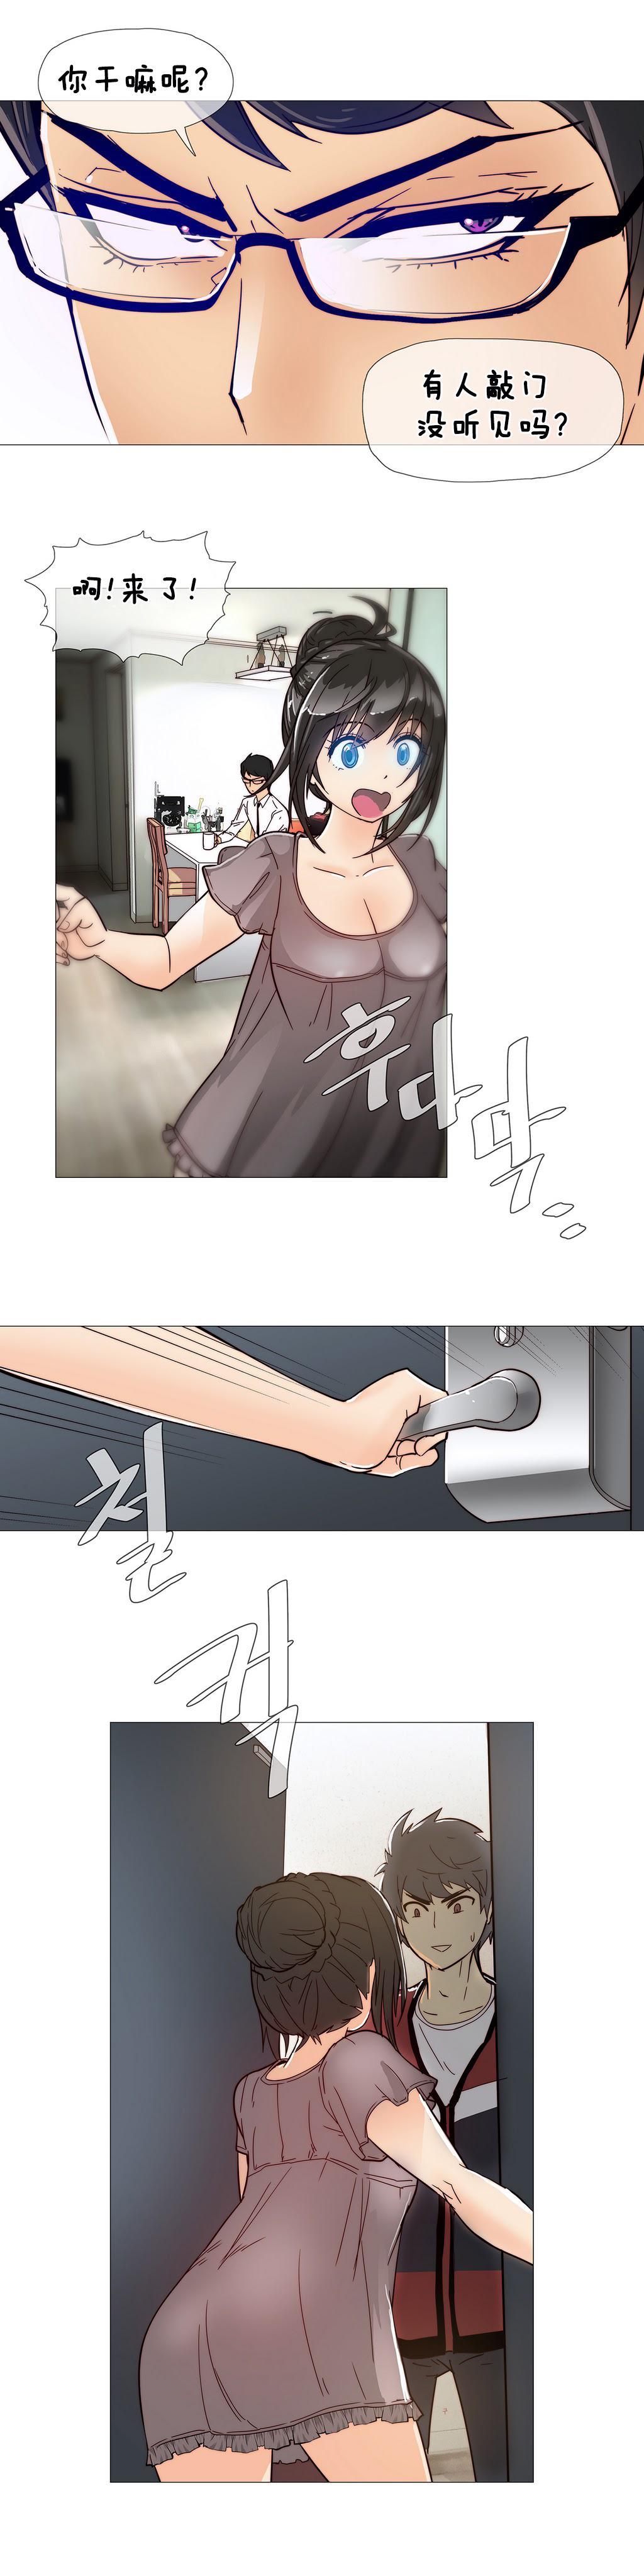 HouseHold Affairs 【卞赤鲤个人汉化】1~21话(持续更新中) 156